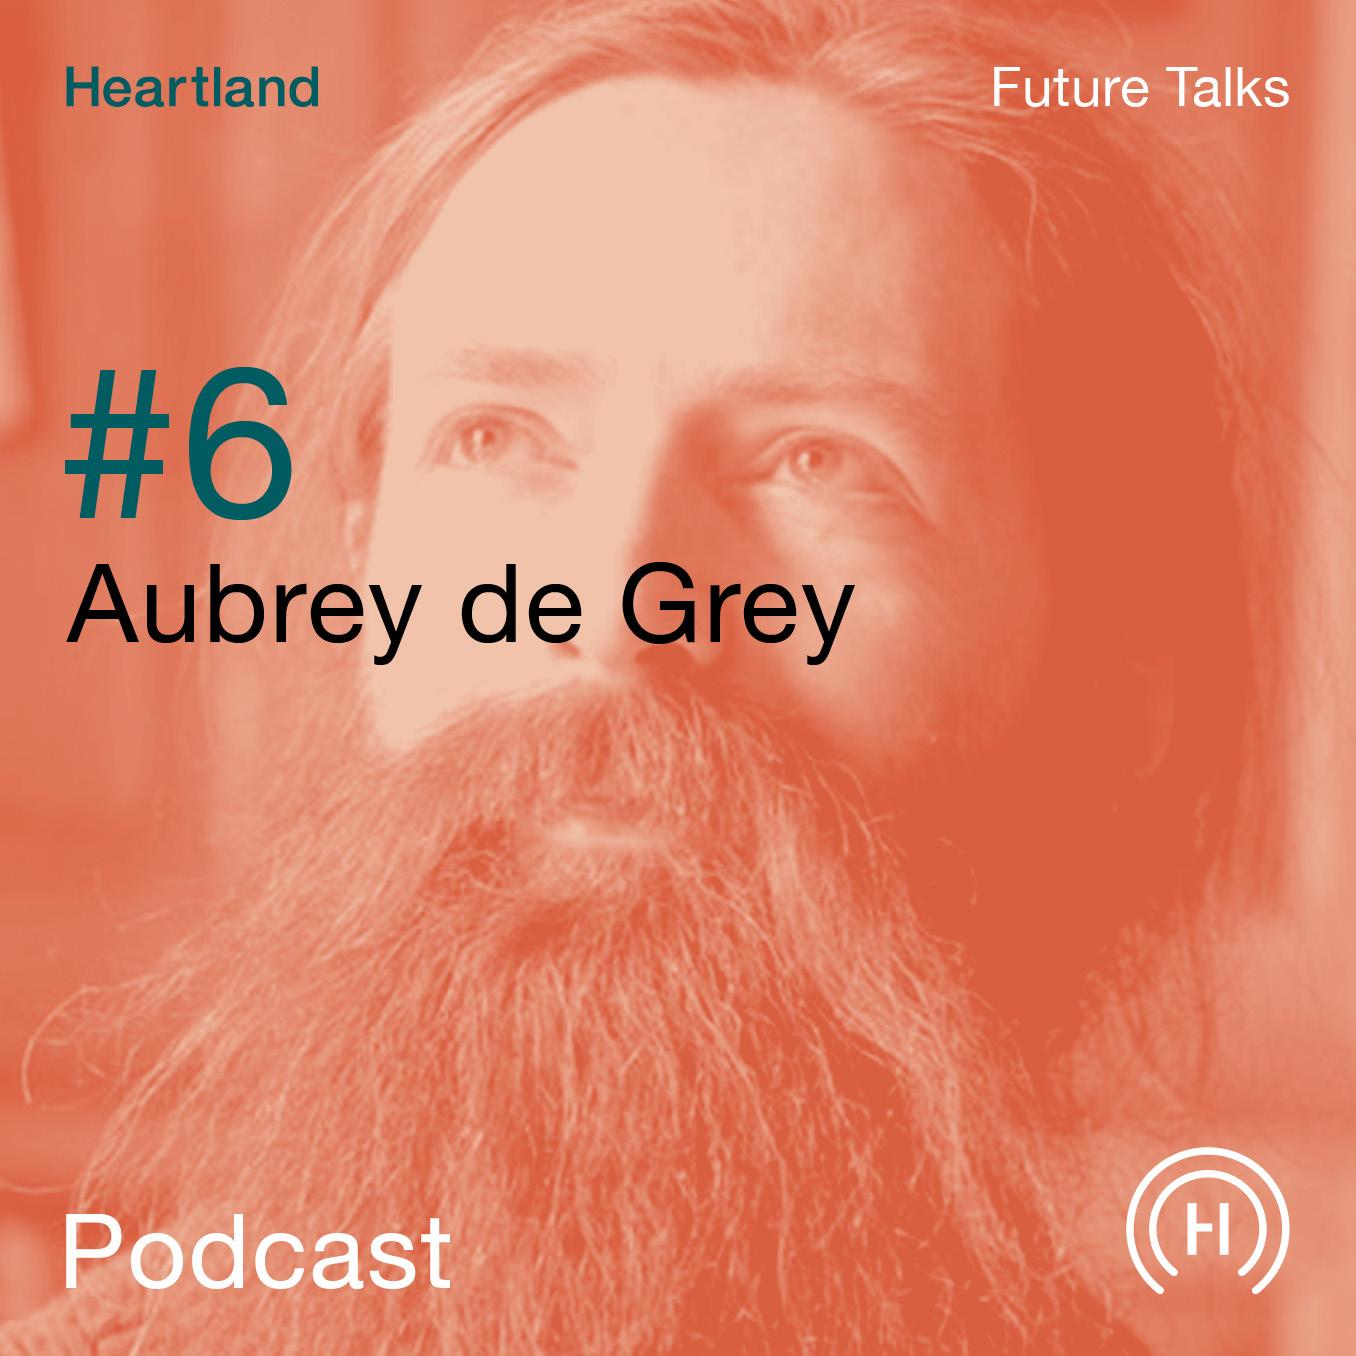 Heartland_New2018_Podcast#6.jpg